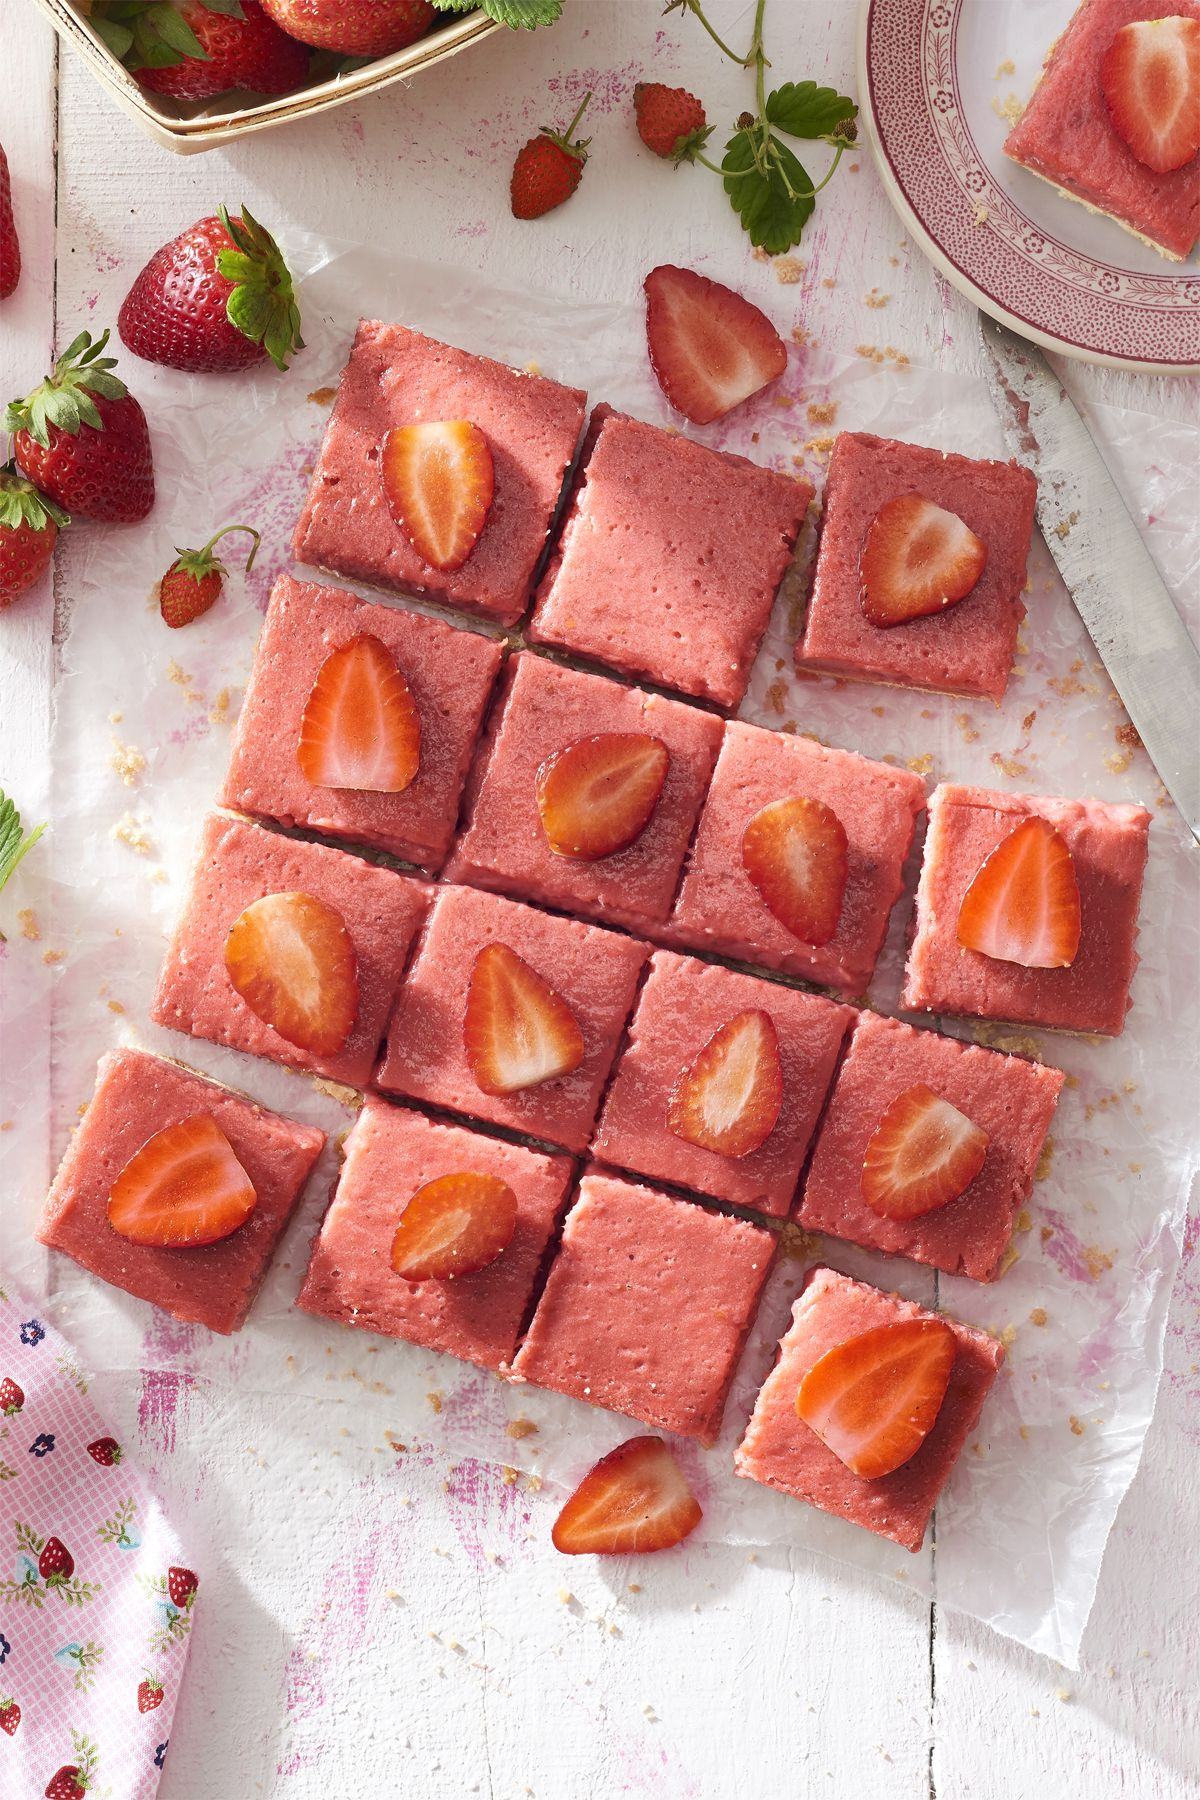 70 Easy Summer Dessert Ideas Best Recipes For Summer Desserts